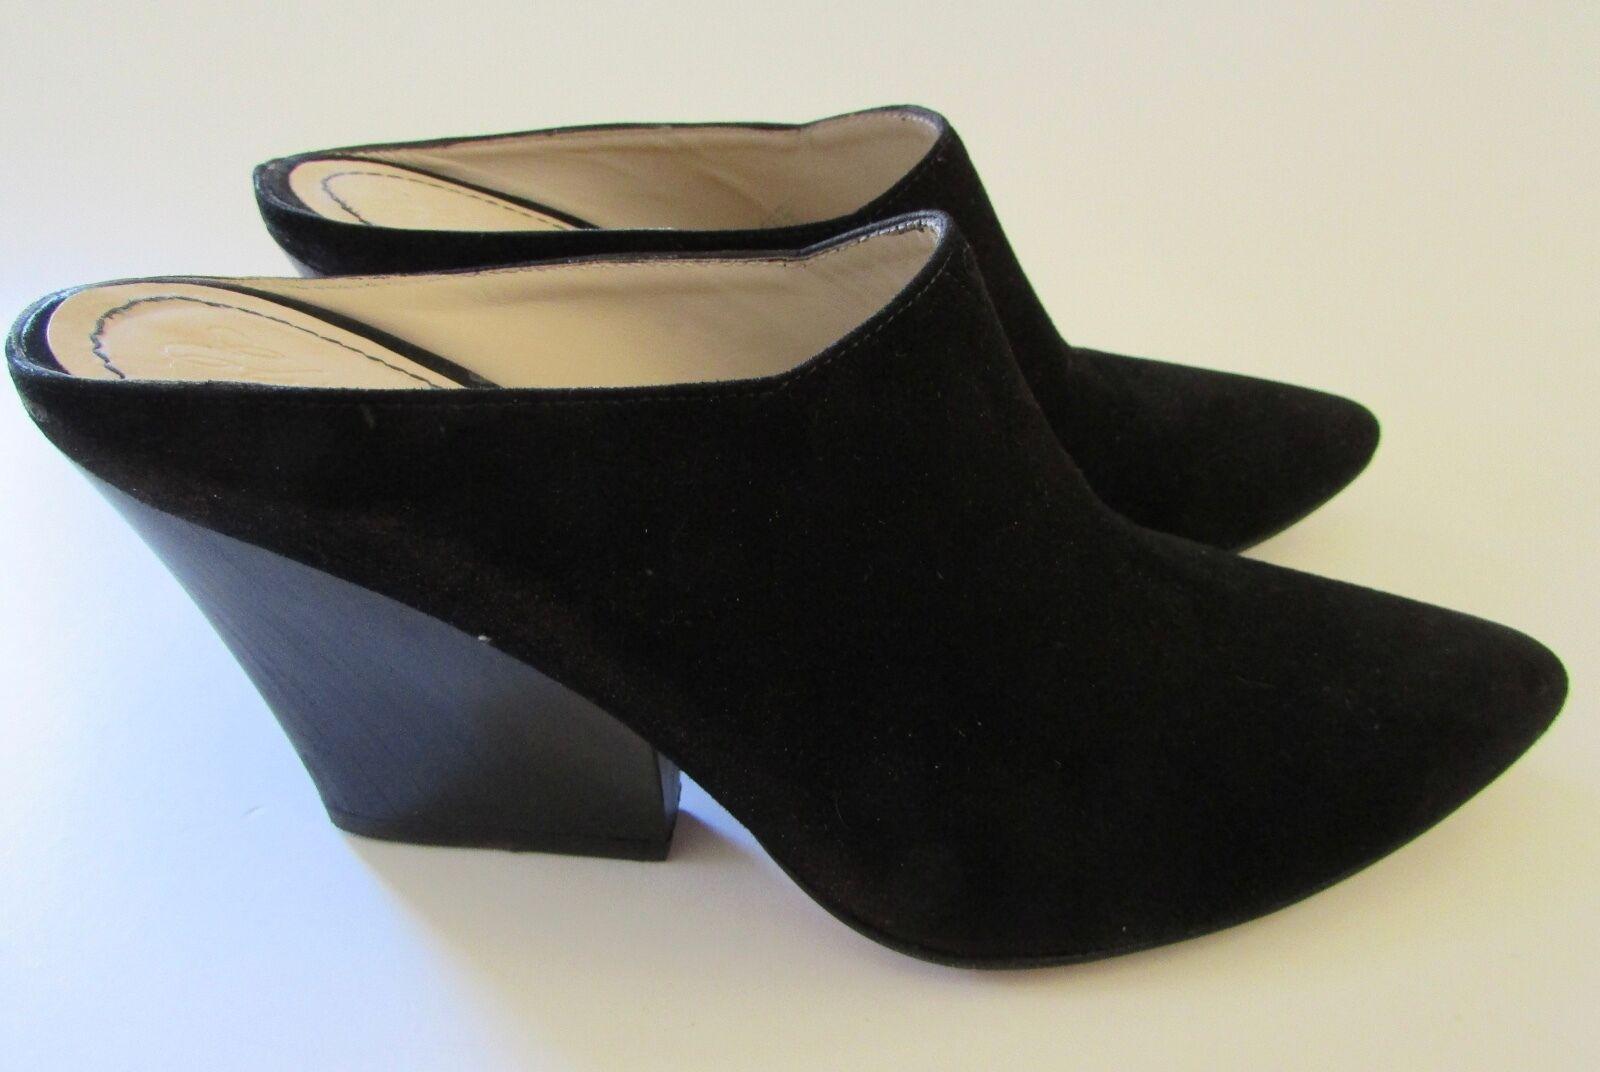 i nuovi marchi outlet online  295 Elizabeth & James  Evie  Pointed Toe Toe Toe nero Suede Wedge Mule 6B  conveniente